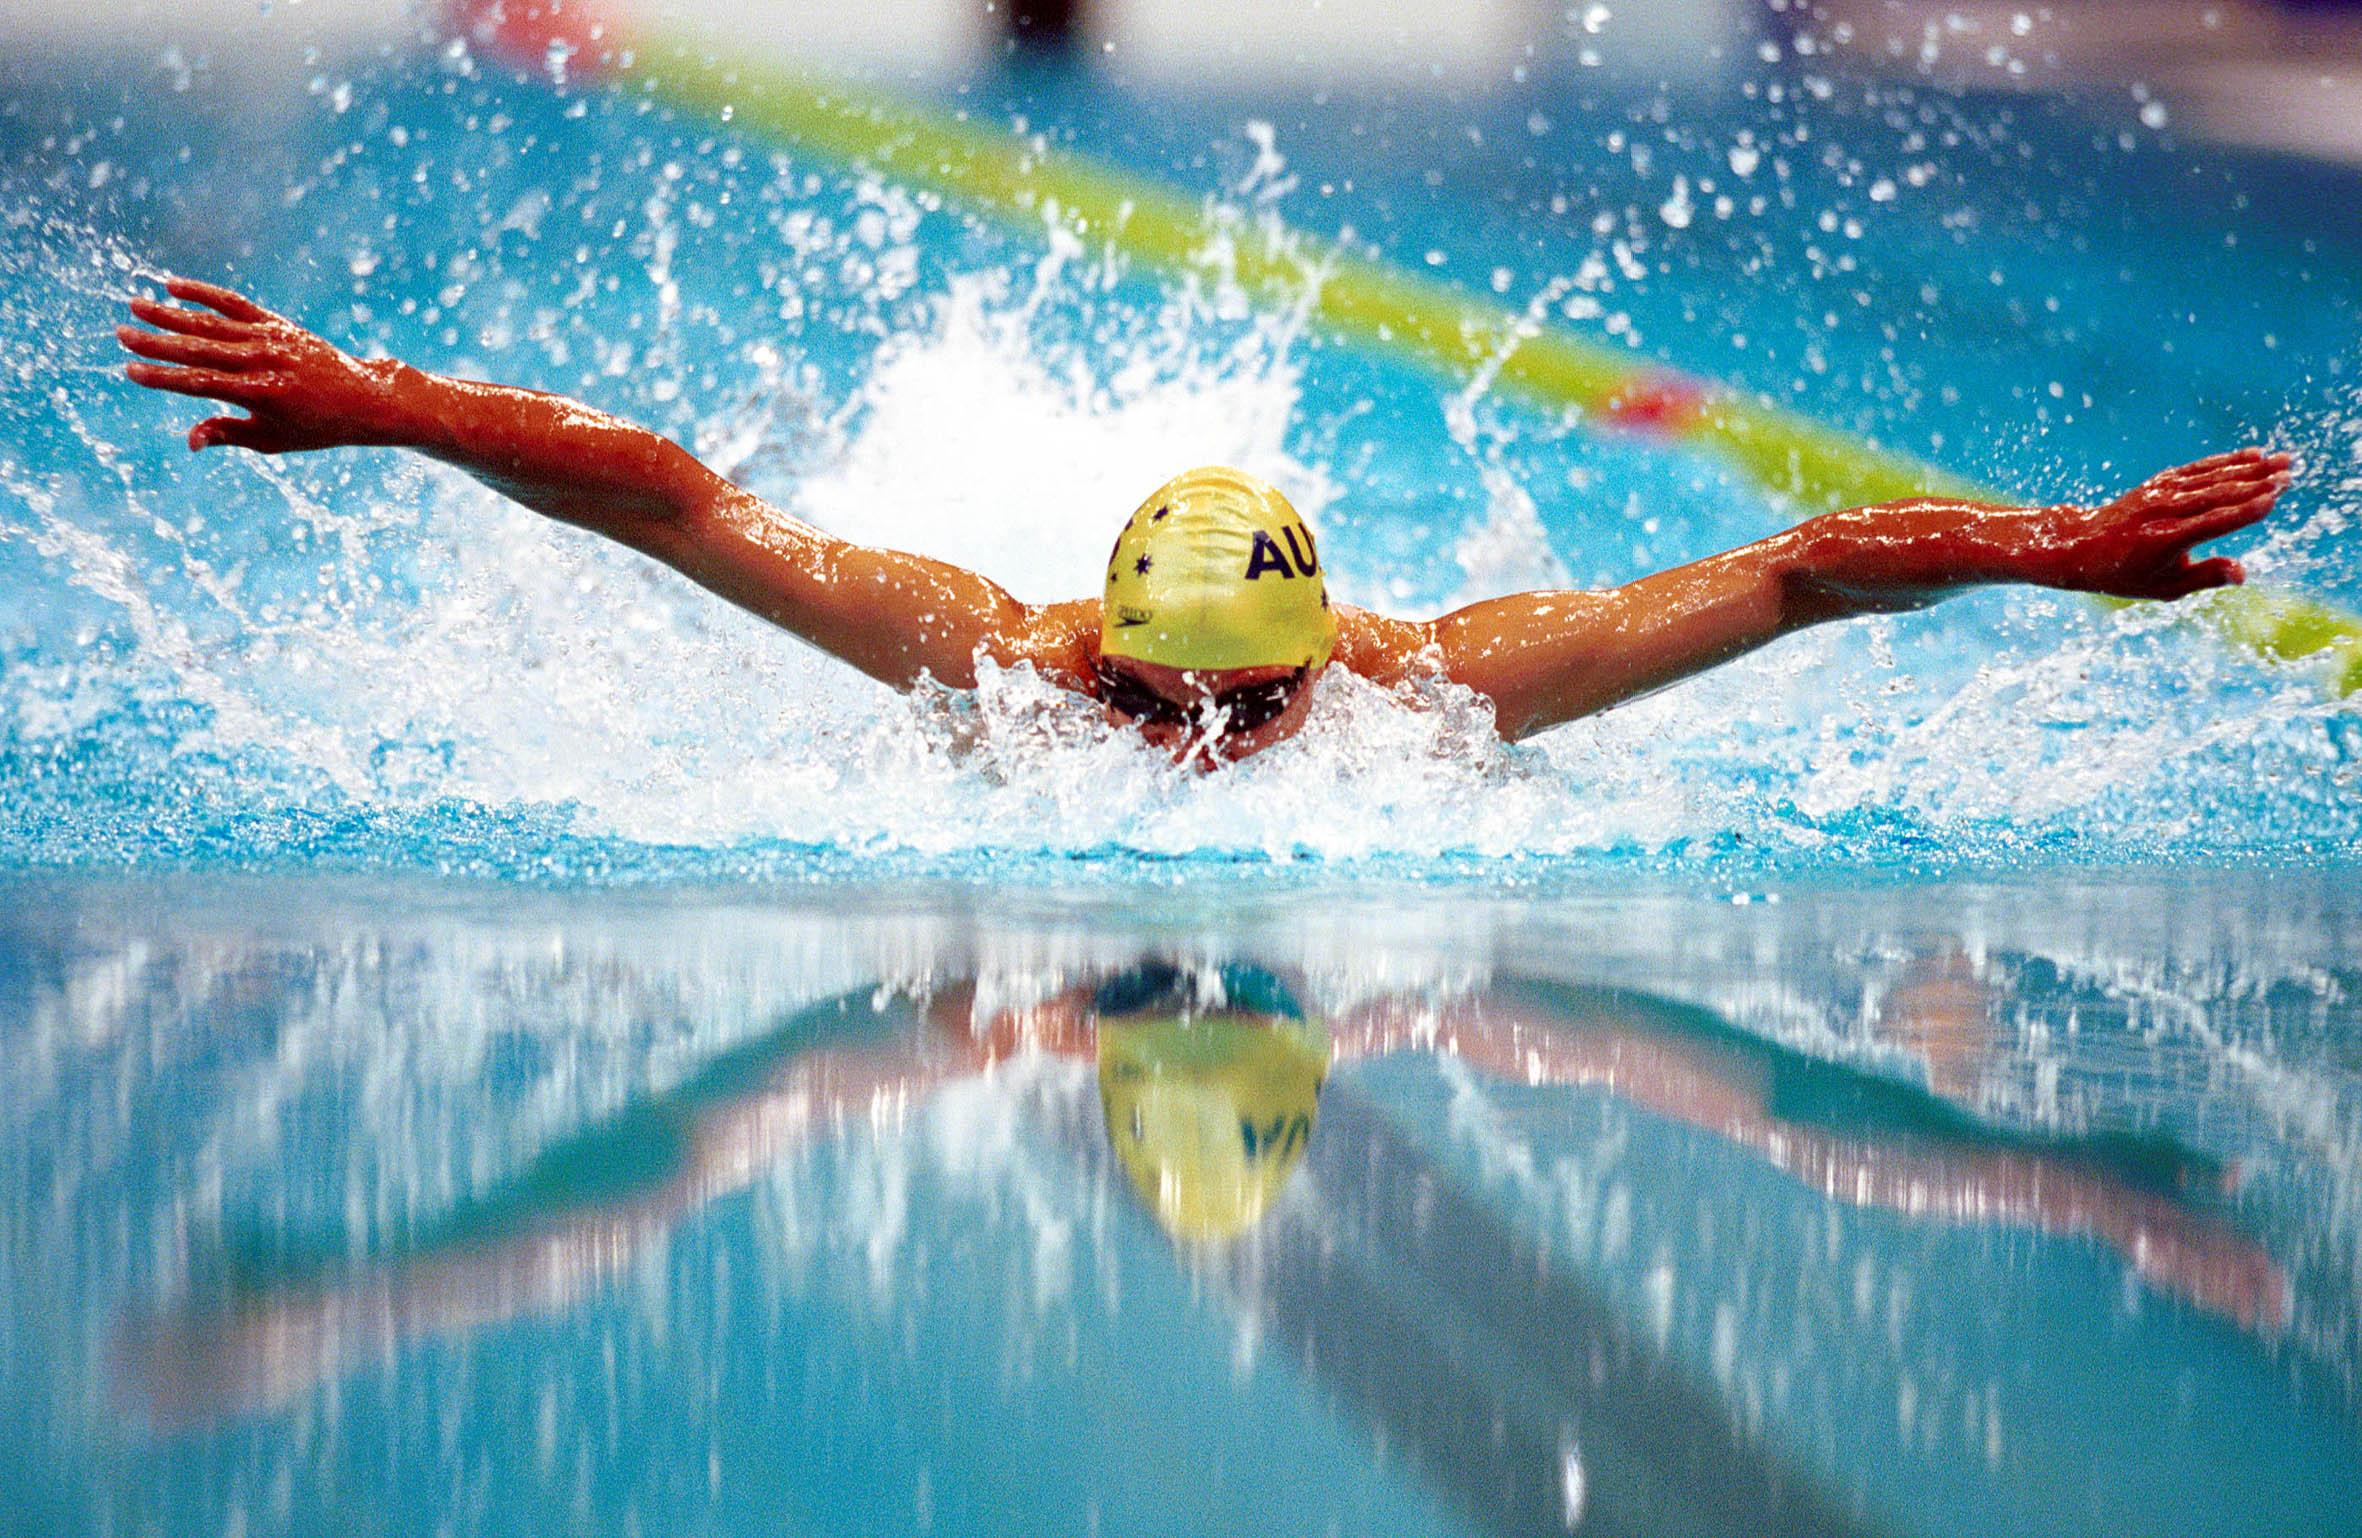 Sport Wallpaper Swim: [44+] HD Swimming Wallpaper On WallpaperSafari